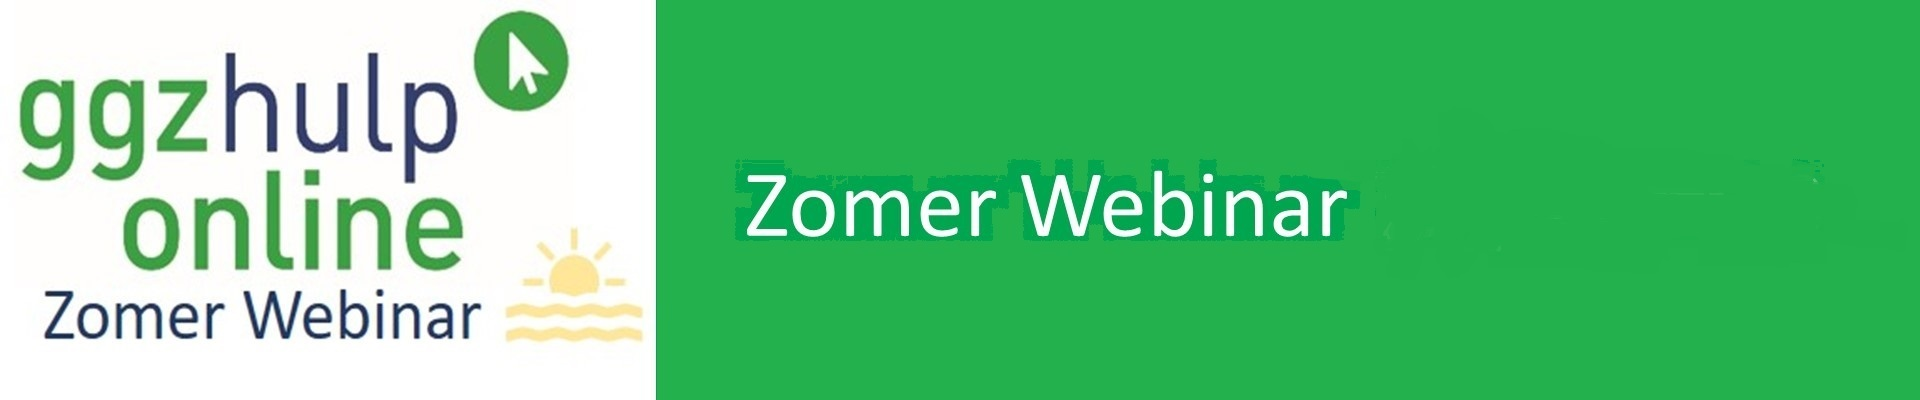 15-09-2020 Zomerwebinar ggzhulponline